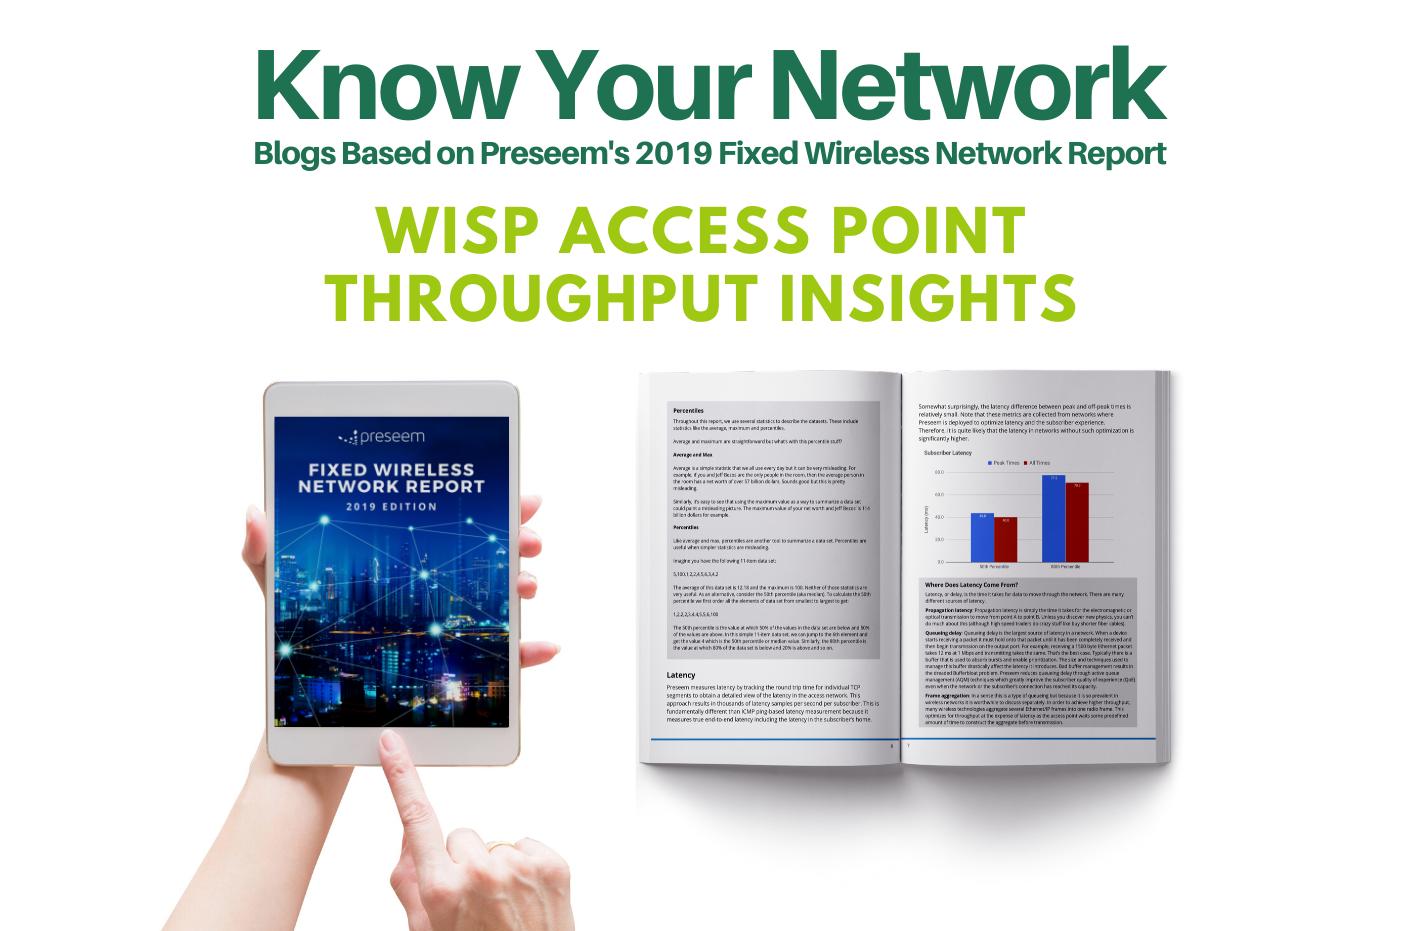 WISP Access Point Throughput Insights